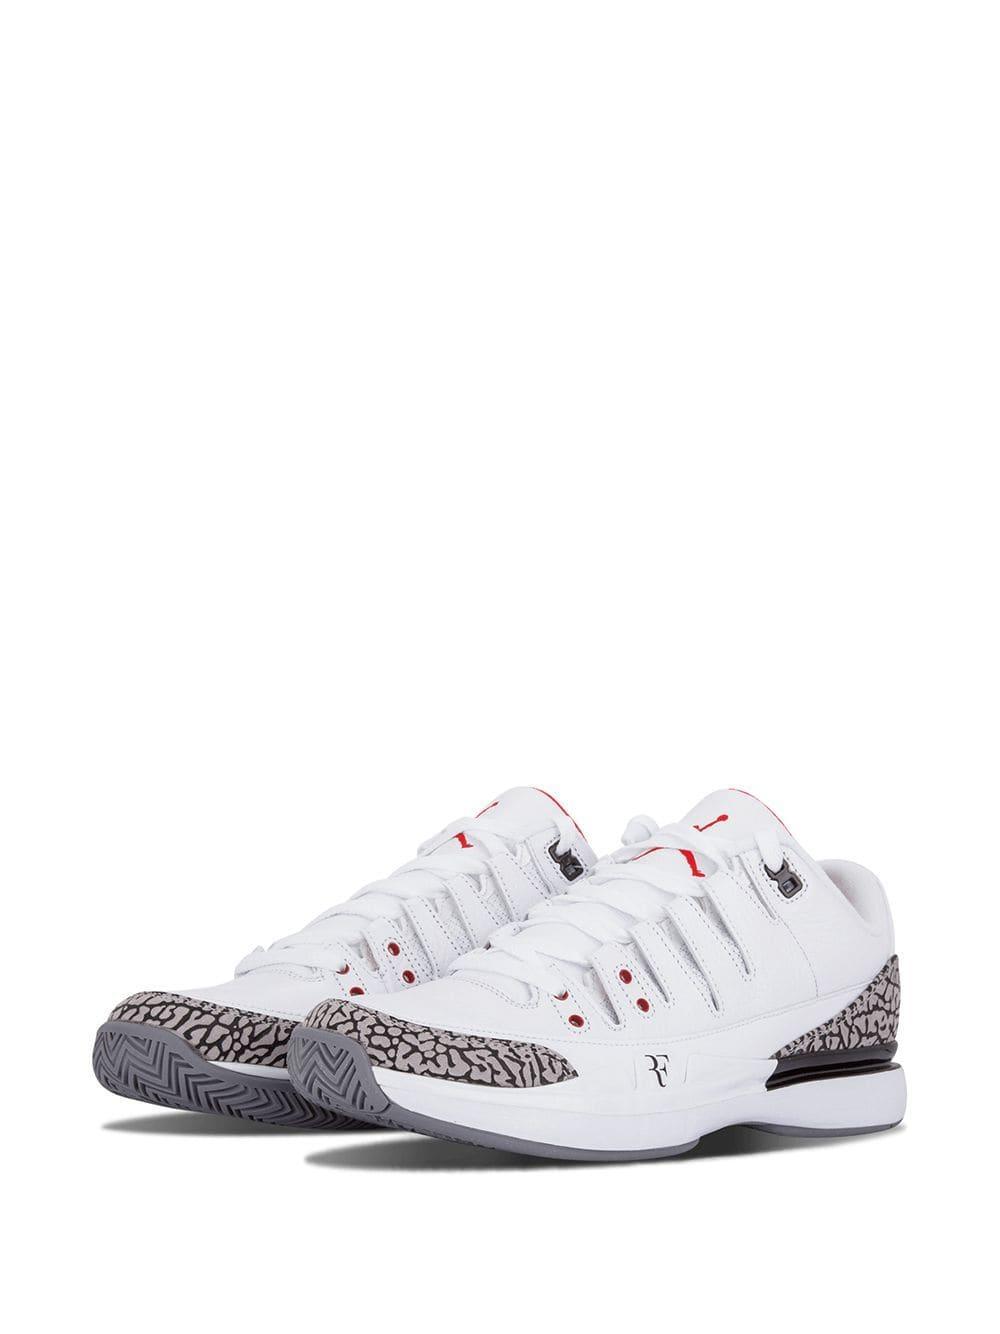 ccb954473d4 Lyst - Nike Zoom Vapor Aj3 Sneakers in White for Men